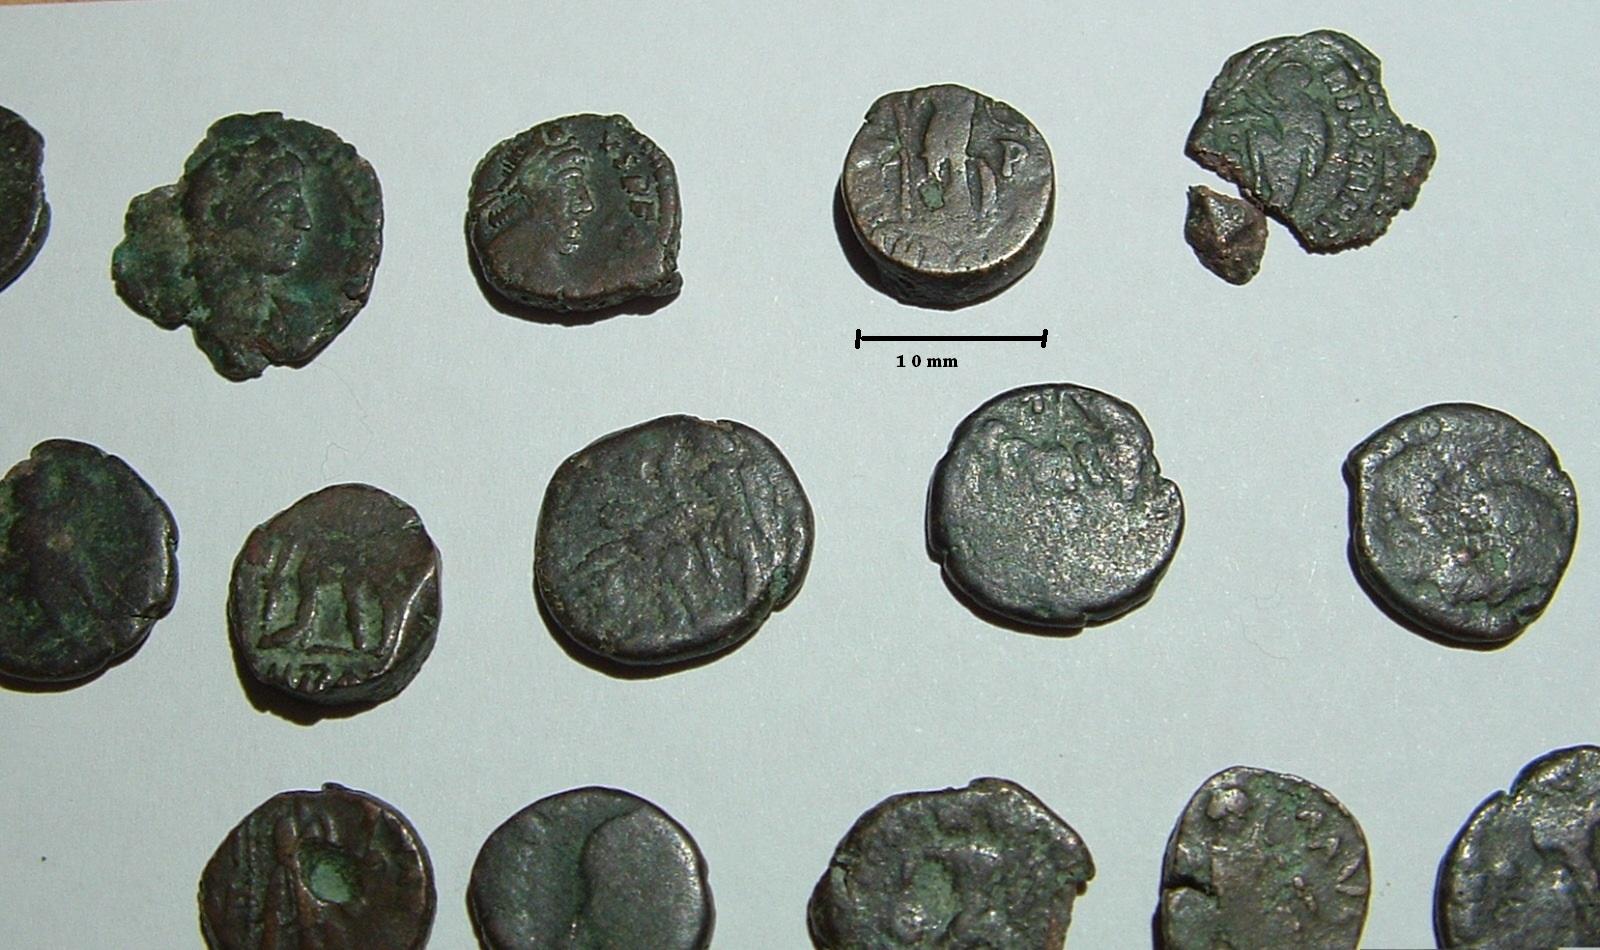 IDENTIFYING ROMAN COINS EPUB DOWNLOAD